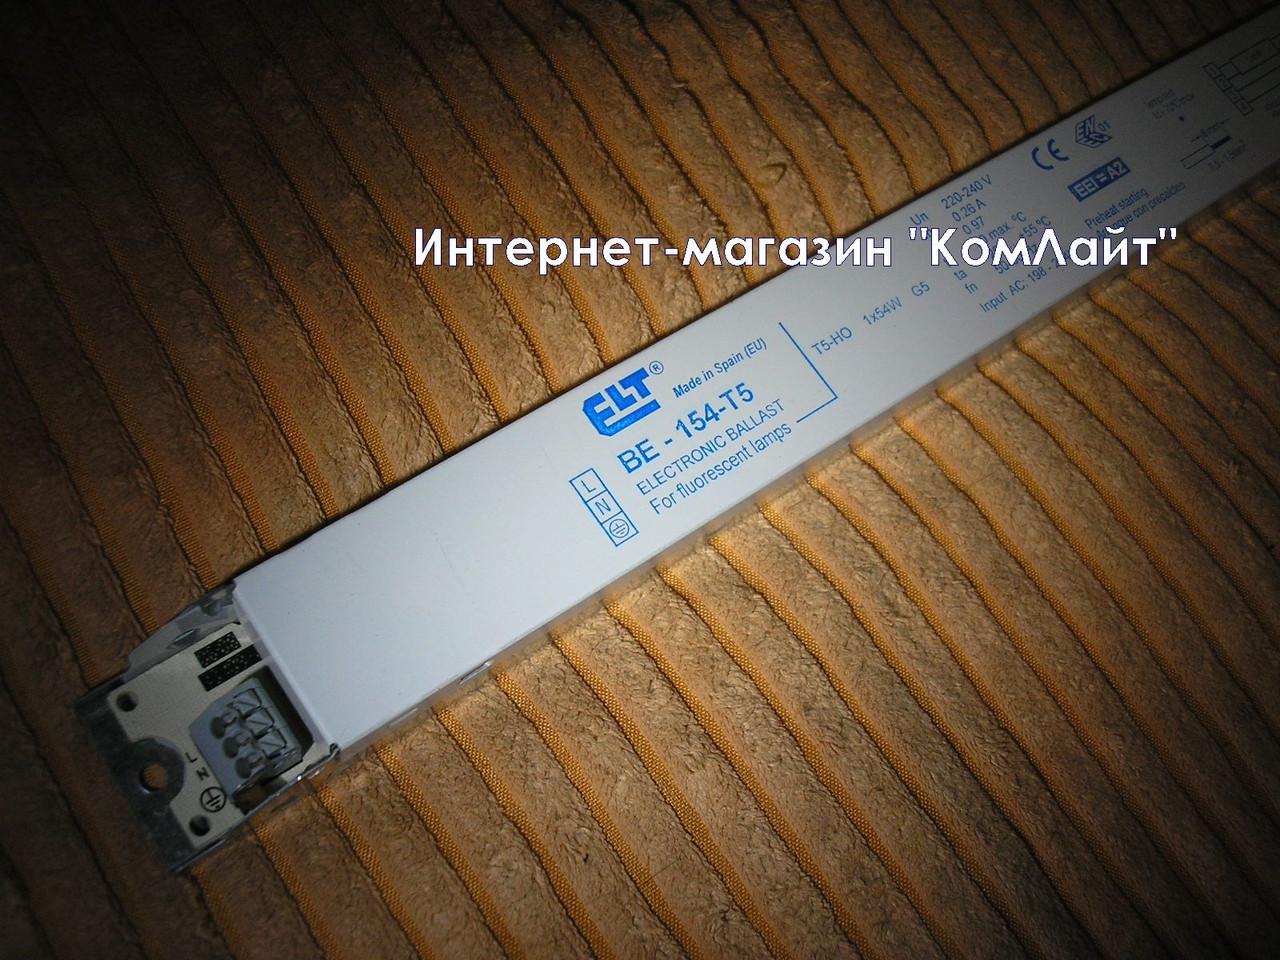 Электронный балласт ELT BE-154-T5 1x54W  220-240V (Испания)